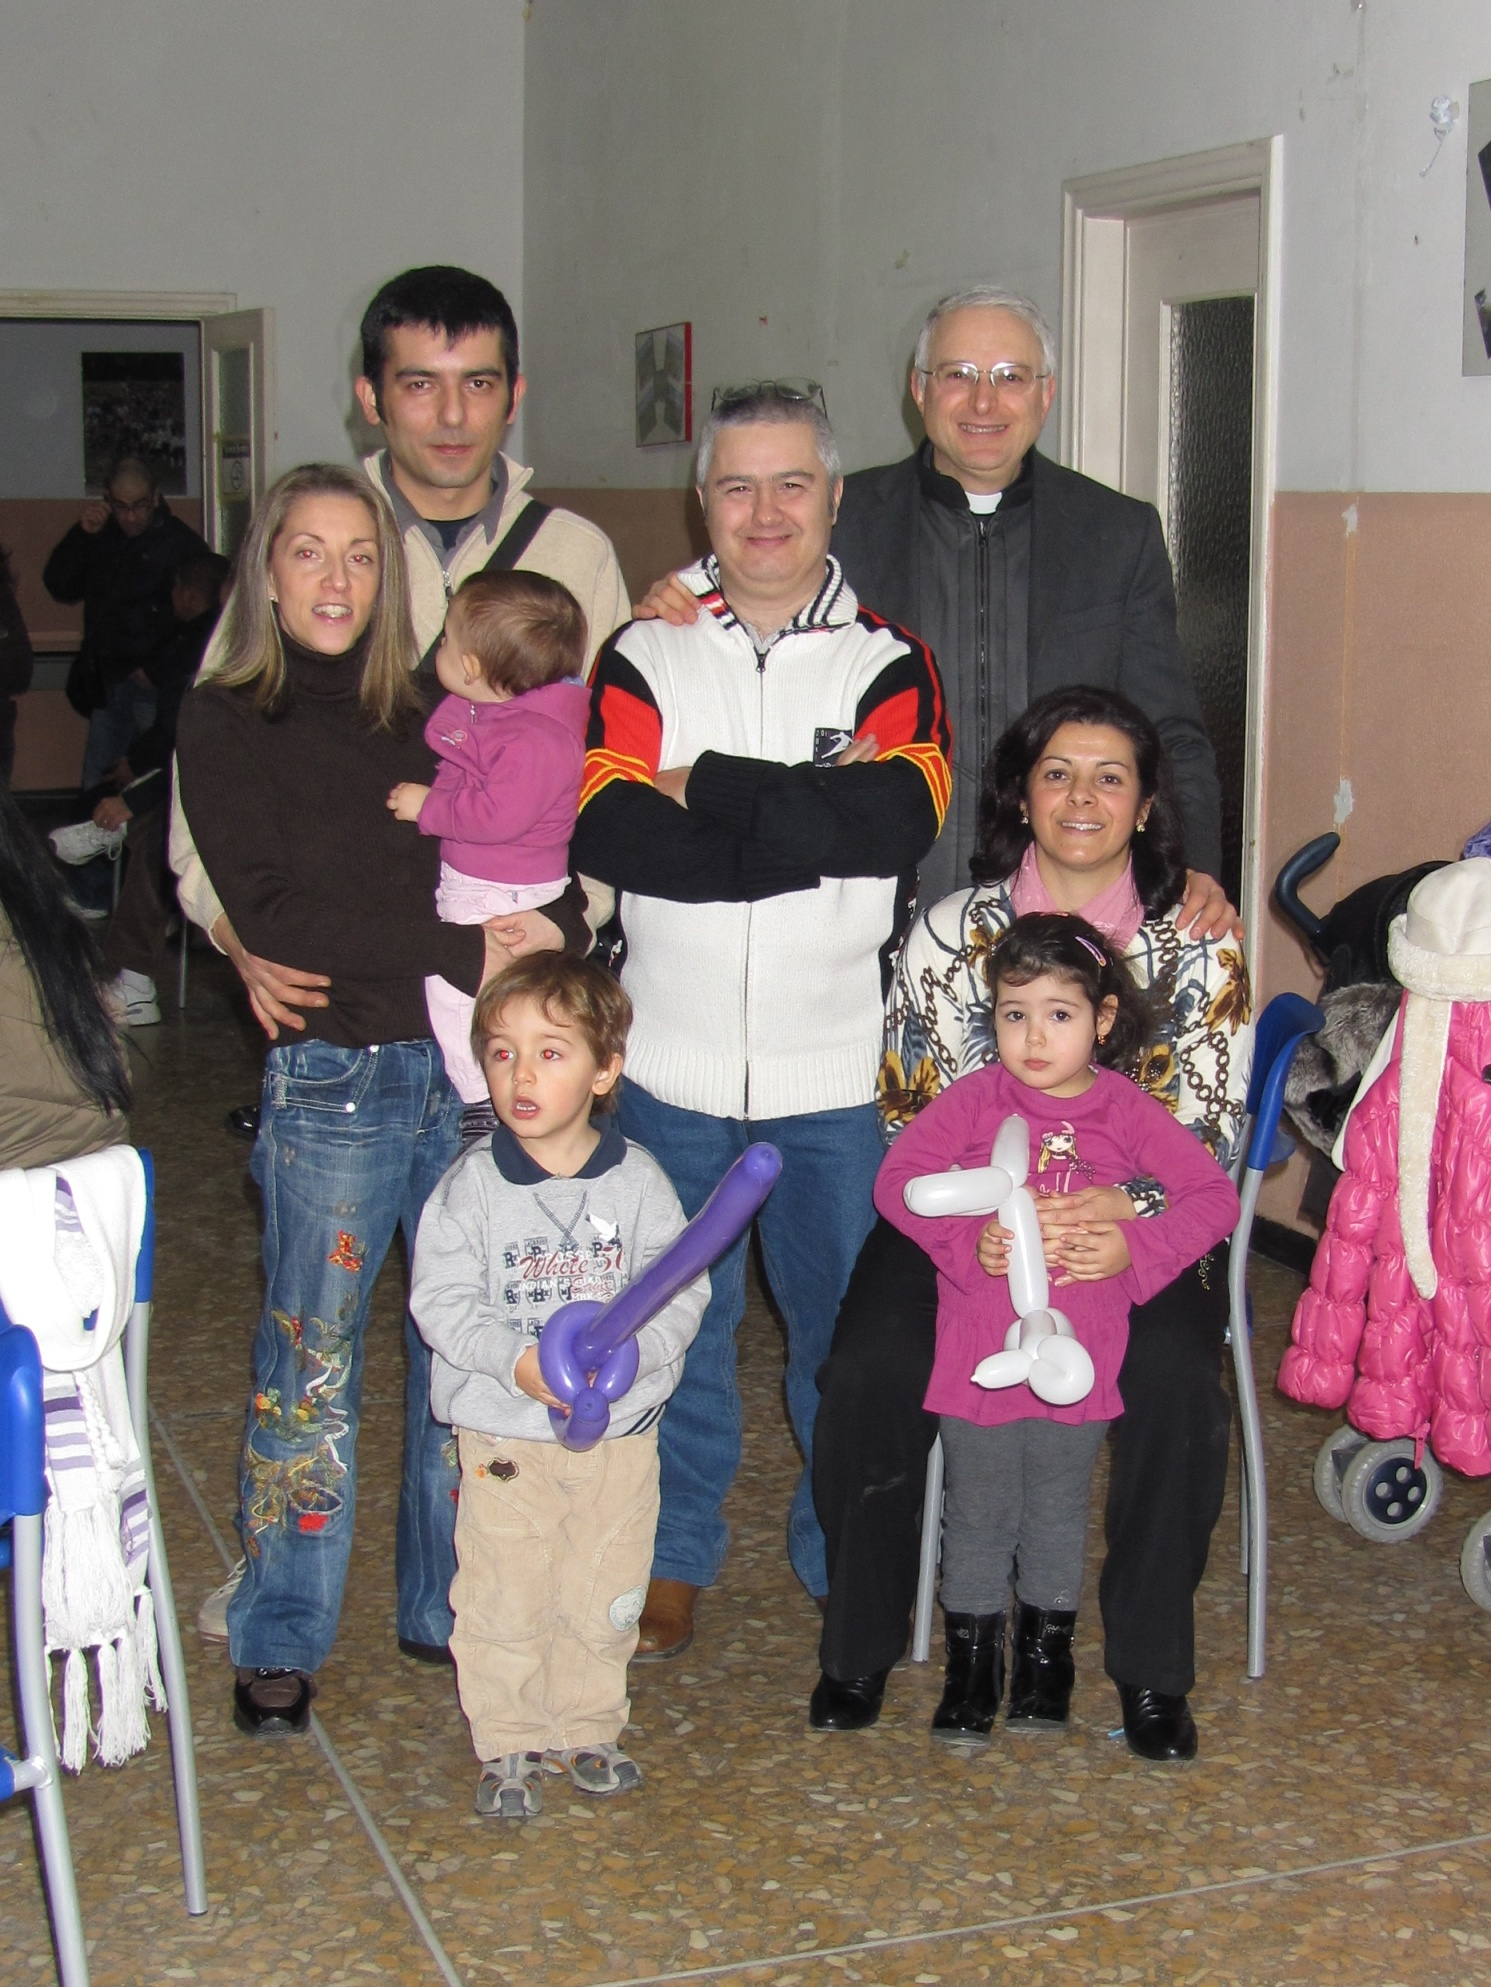 ricordo_battesimo_gesu_2011-01-23-17-19-30